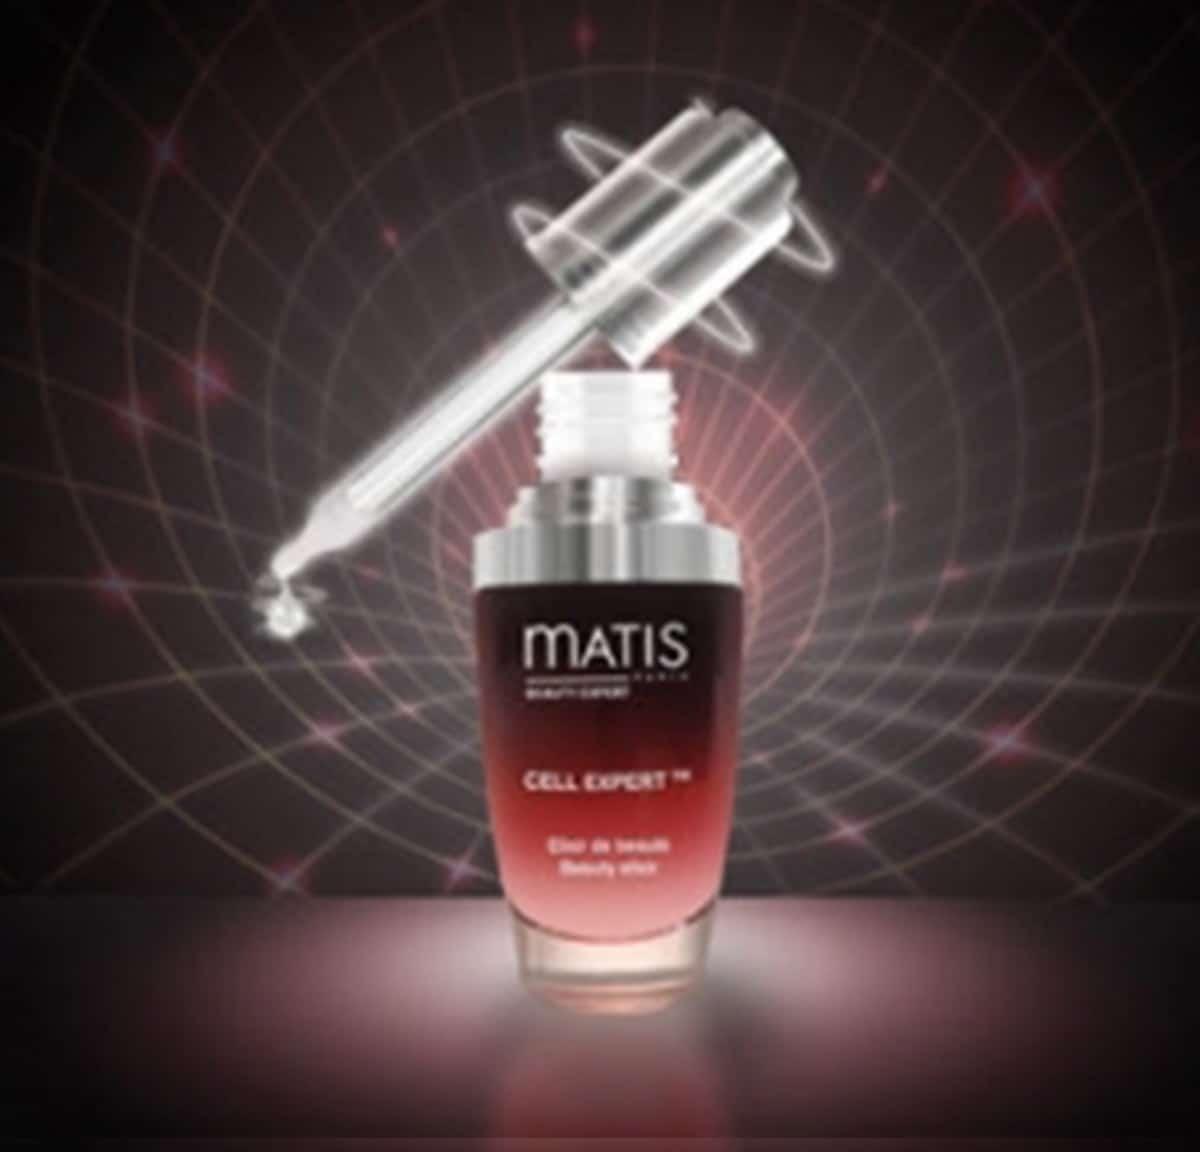 Matis Cell Matis Splush Online